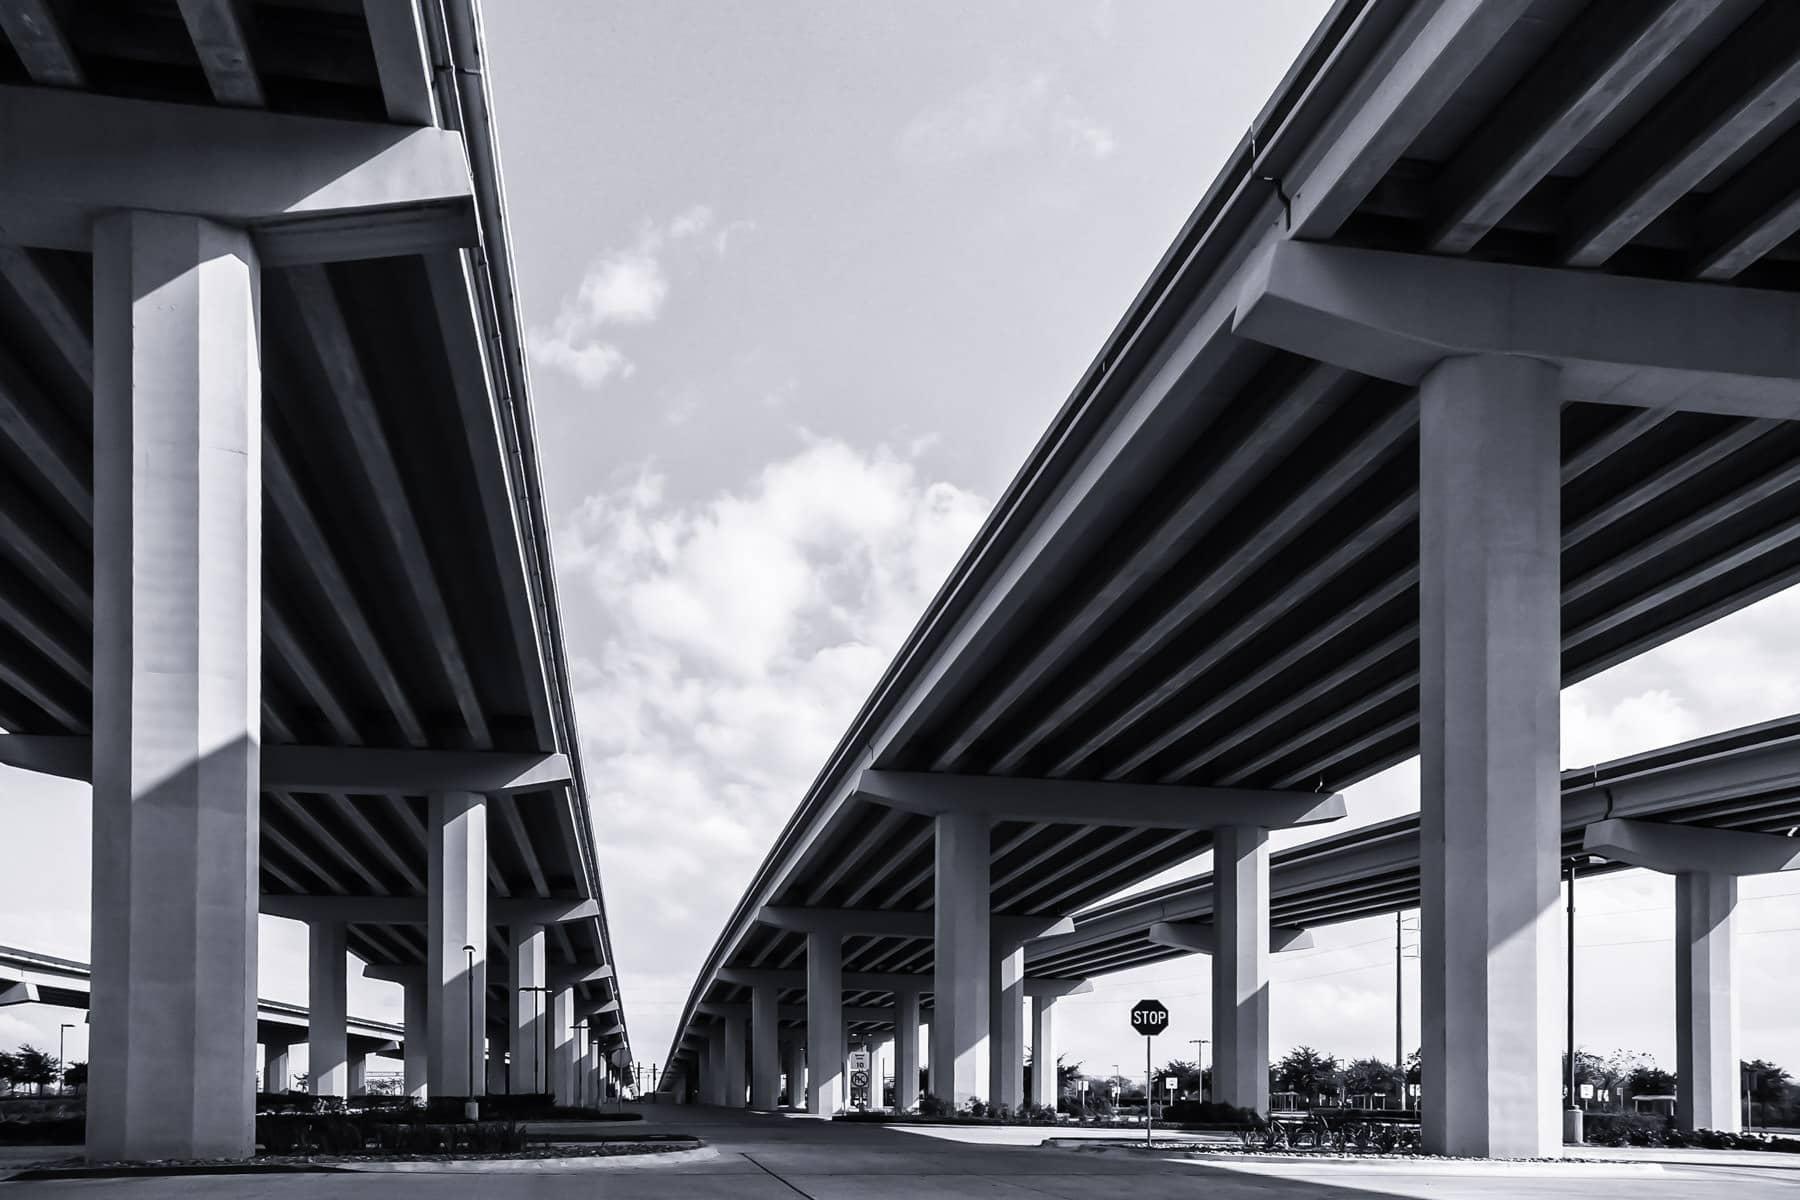 Bridges over US-75 on the President George Bush Turnpike, Plano, Texas.